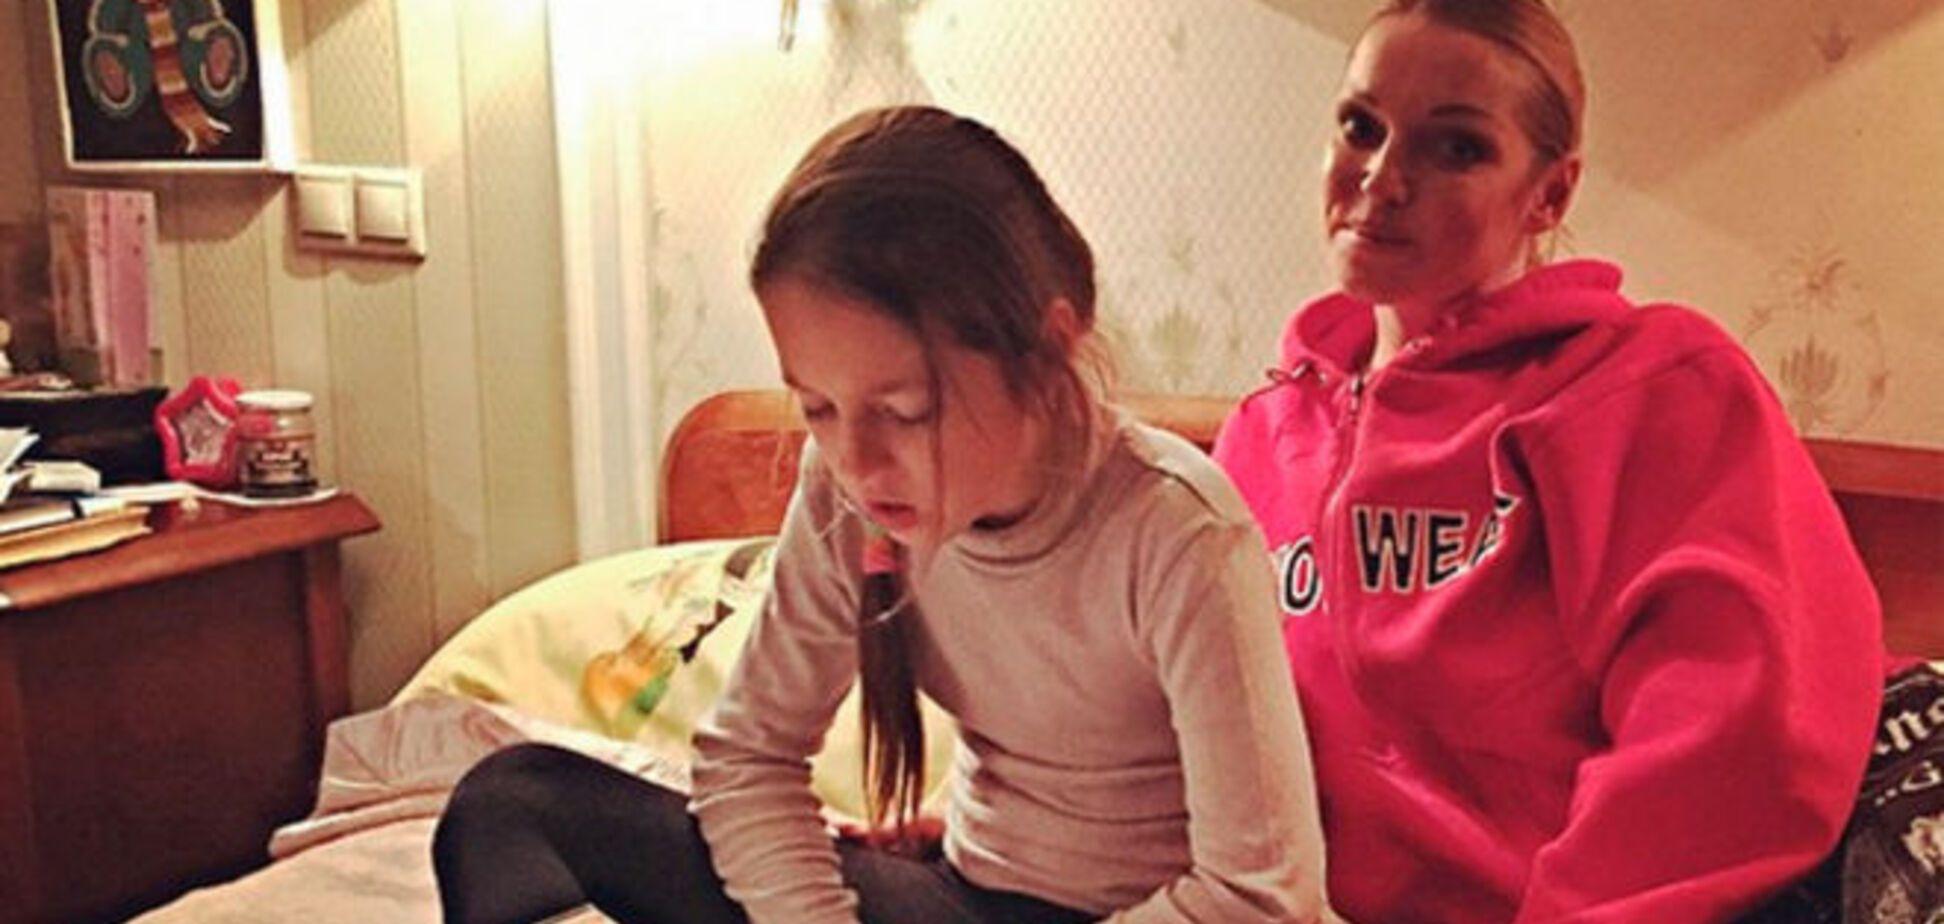 Анастасия Волочкова пьет и курит при дочери